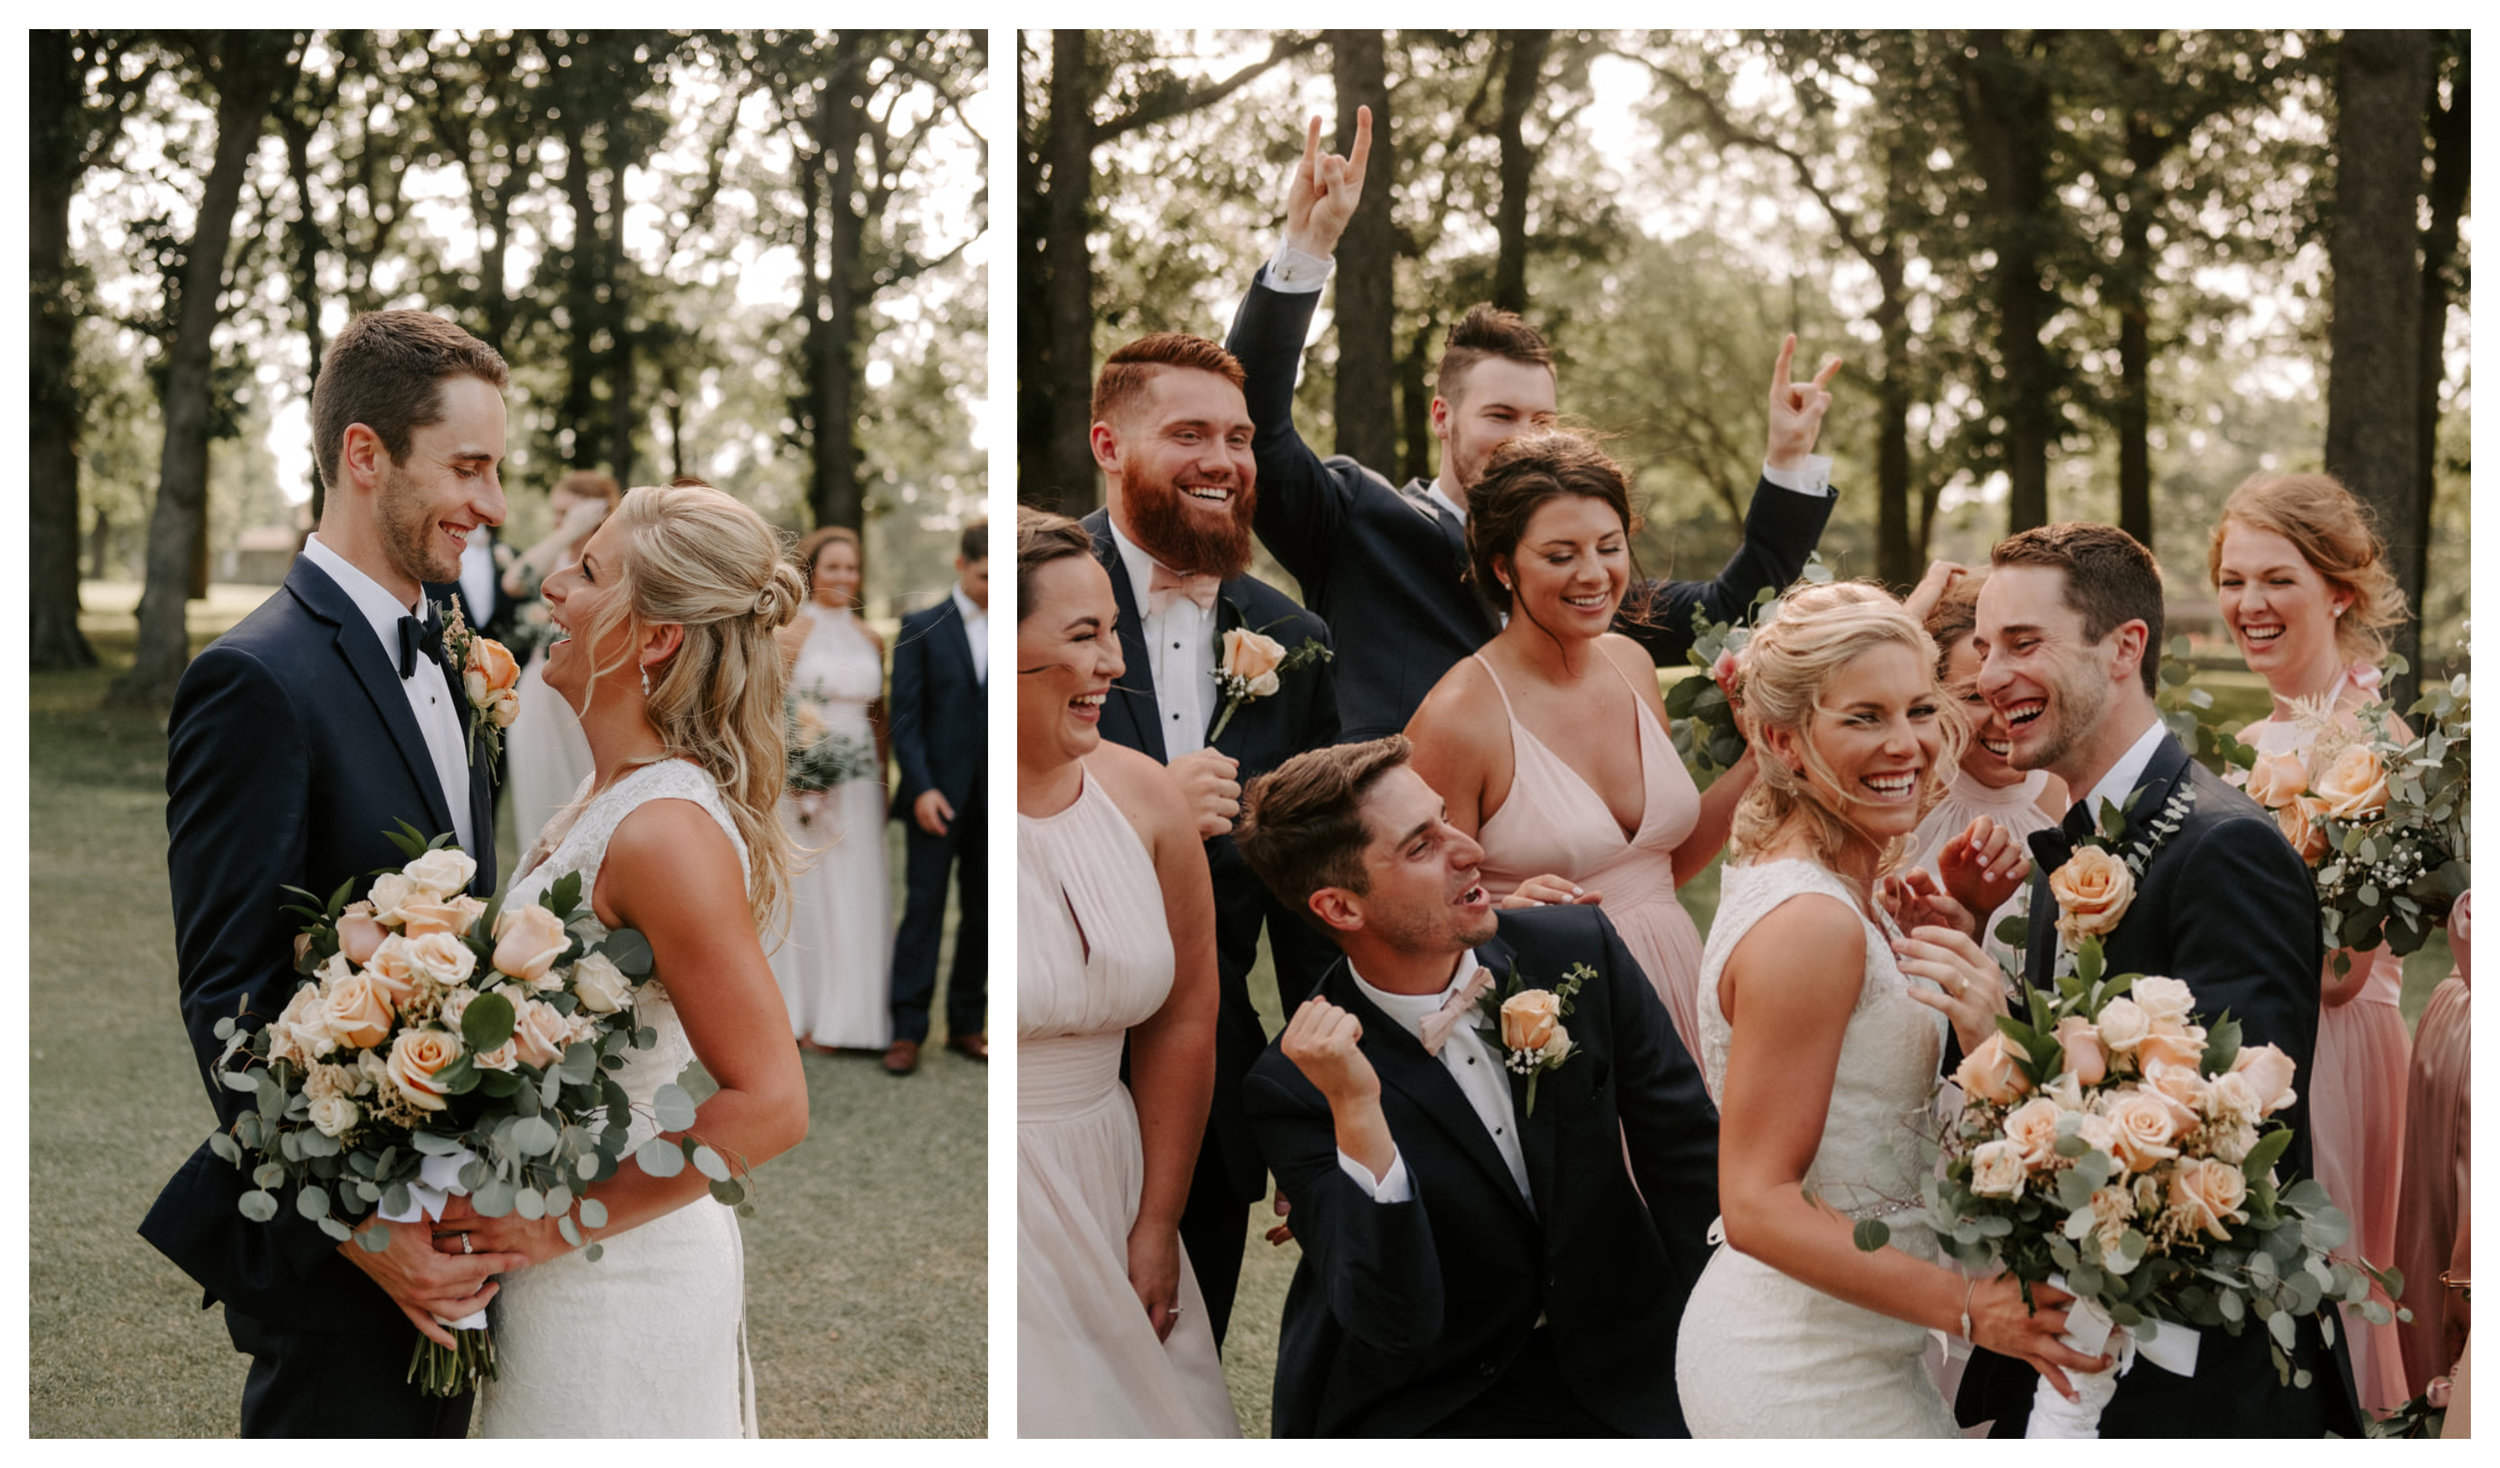 Webster Wedding Blog - Kansas City Bride13